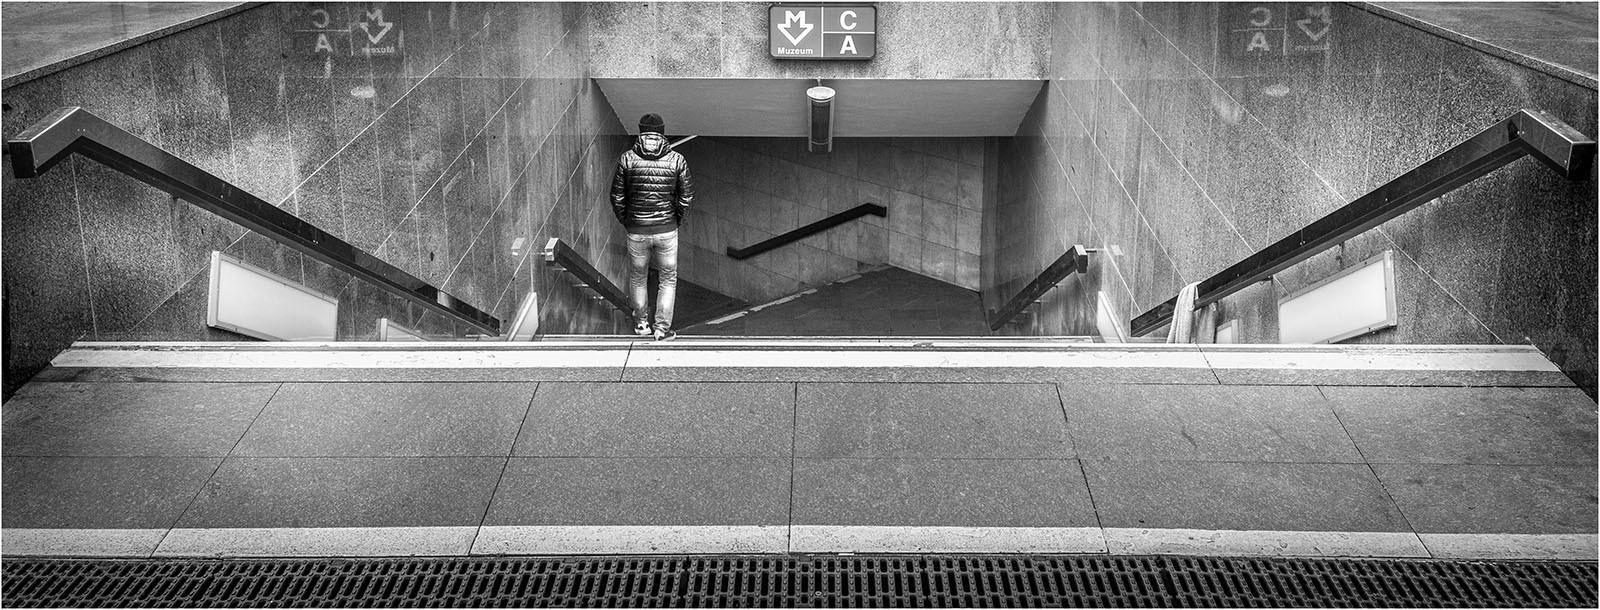 'Subway' by  Joel Fitzpatrick (9 marks)  -  CB Camera Club